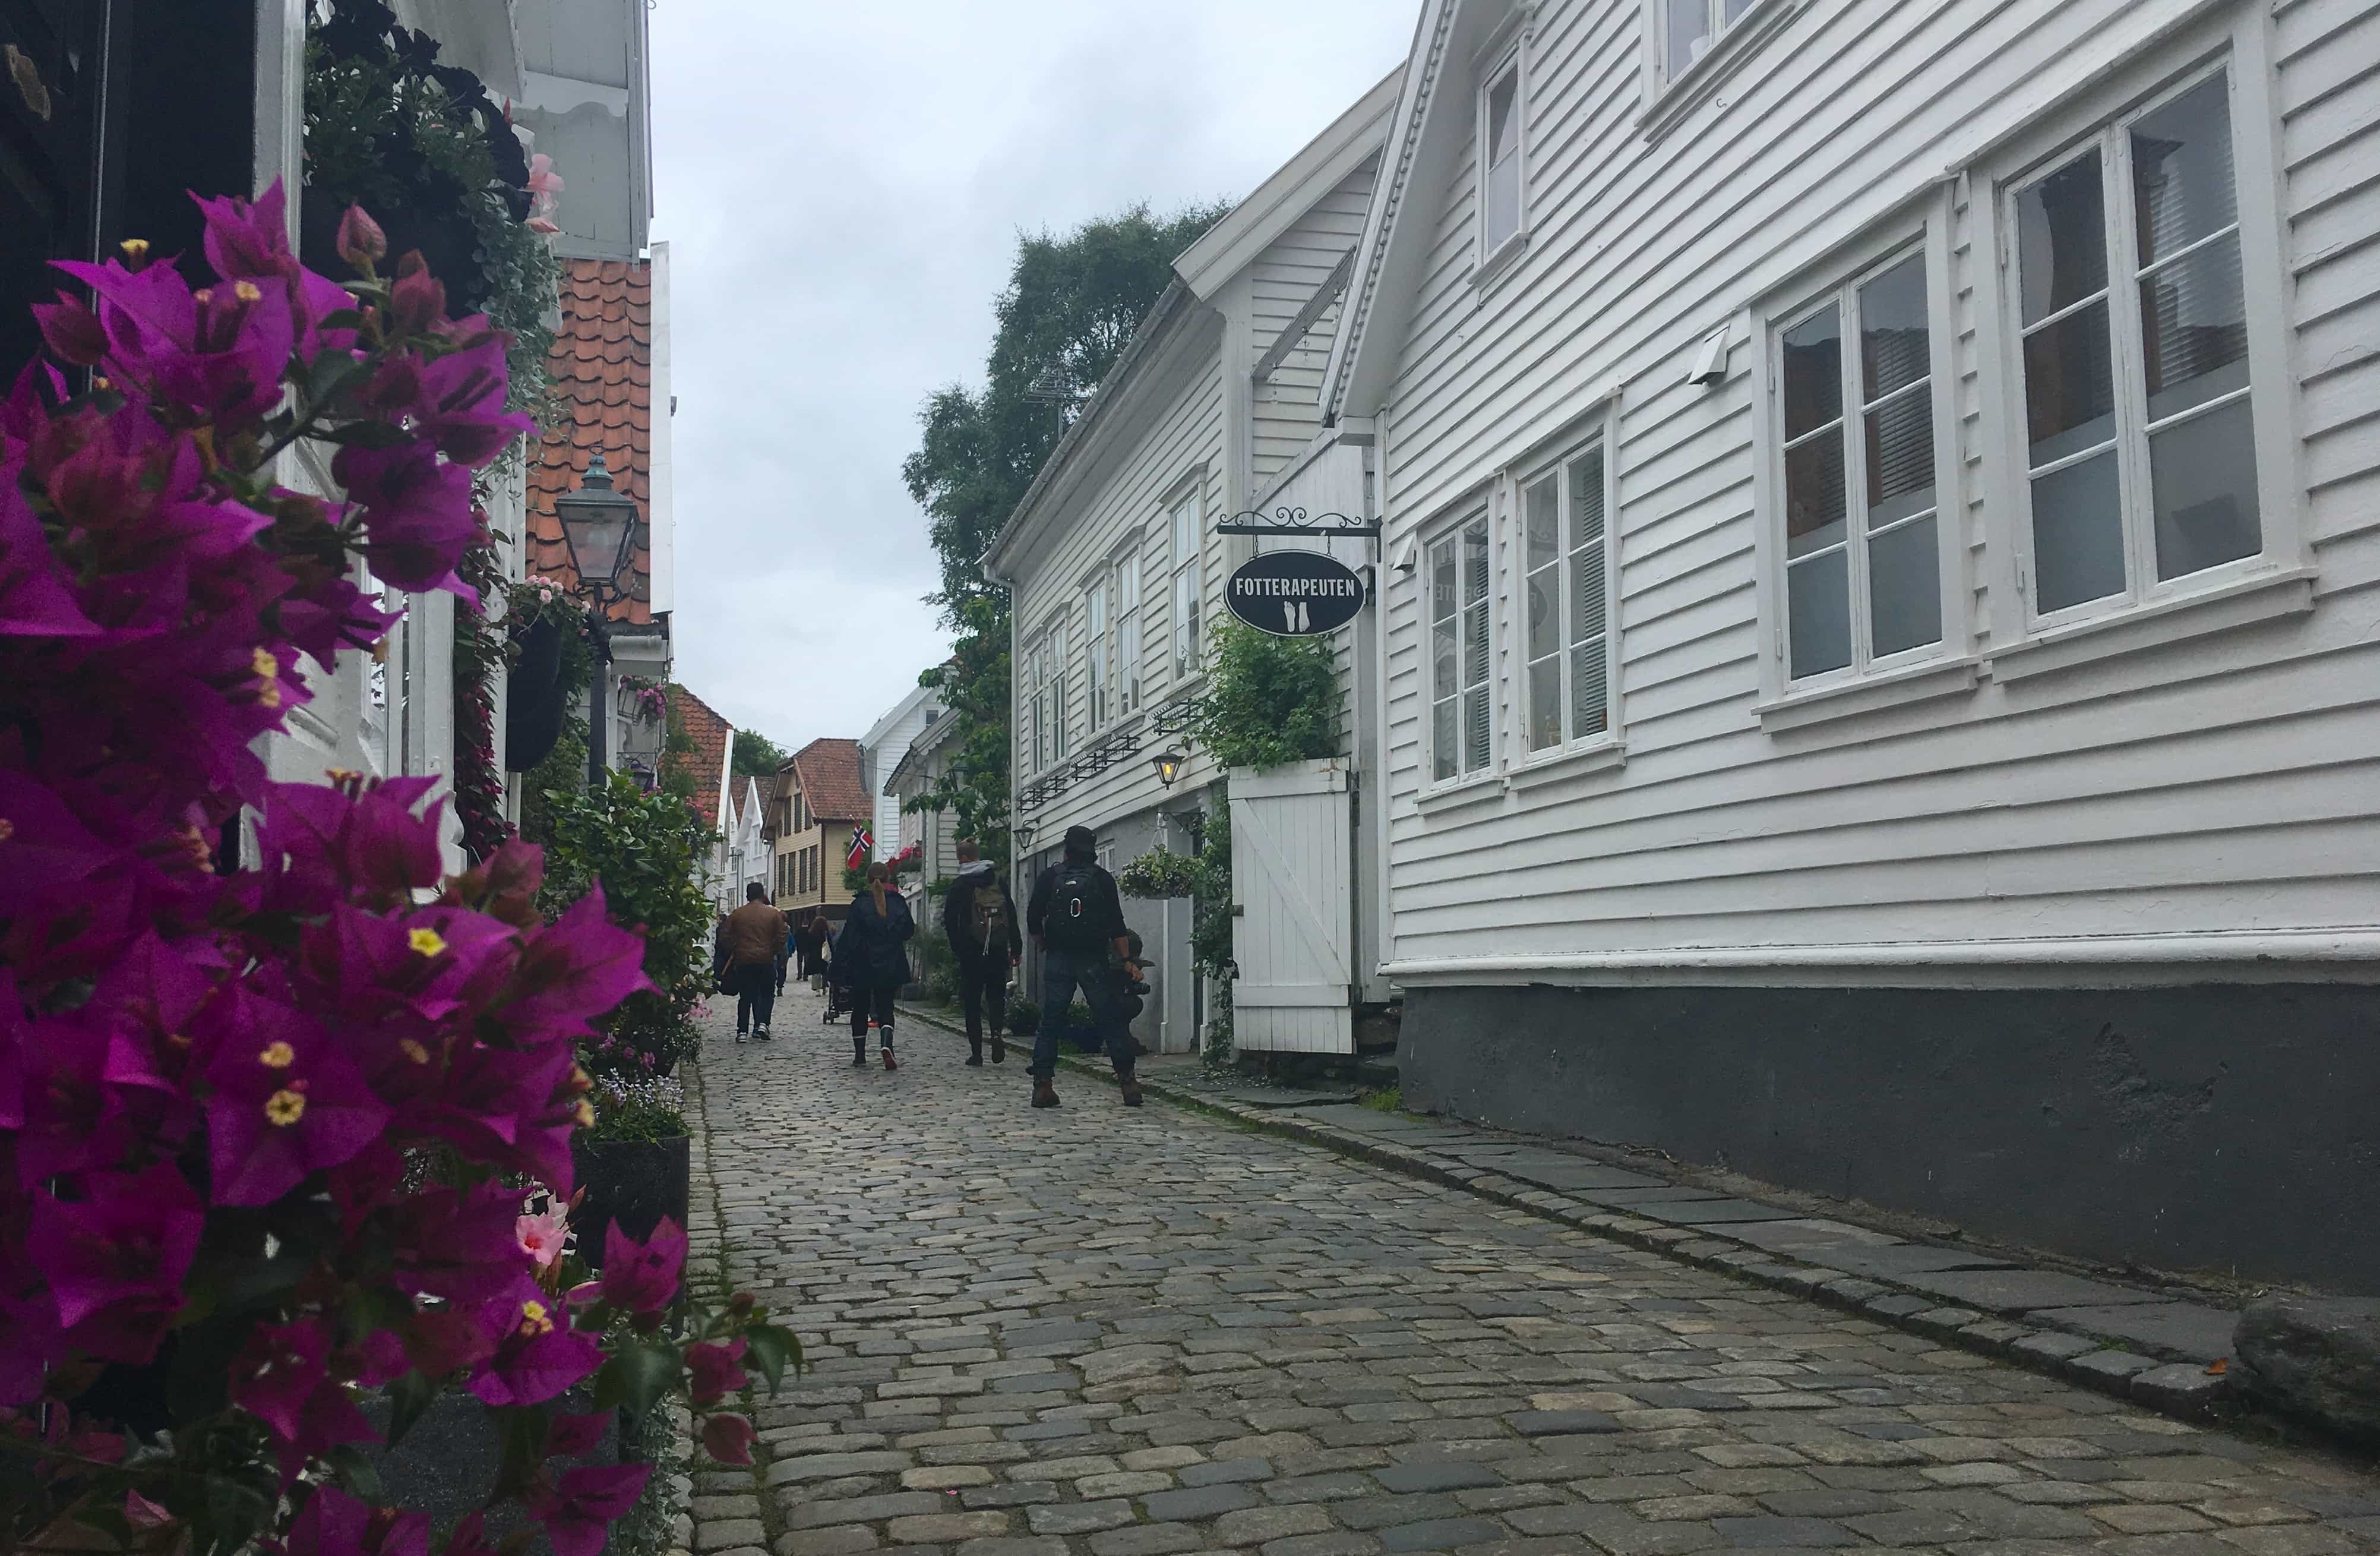 norway norwegian fjords cobbled streets old town bergen